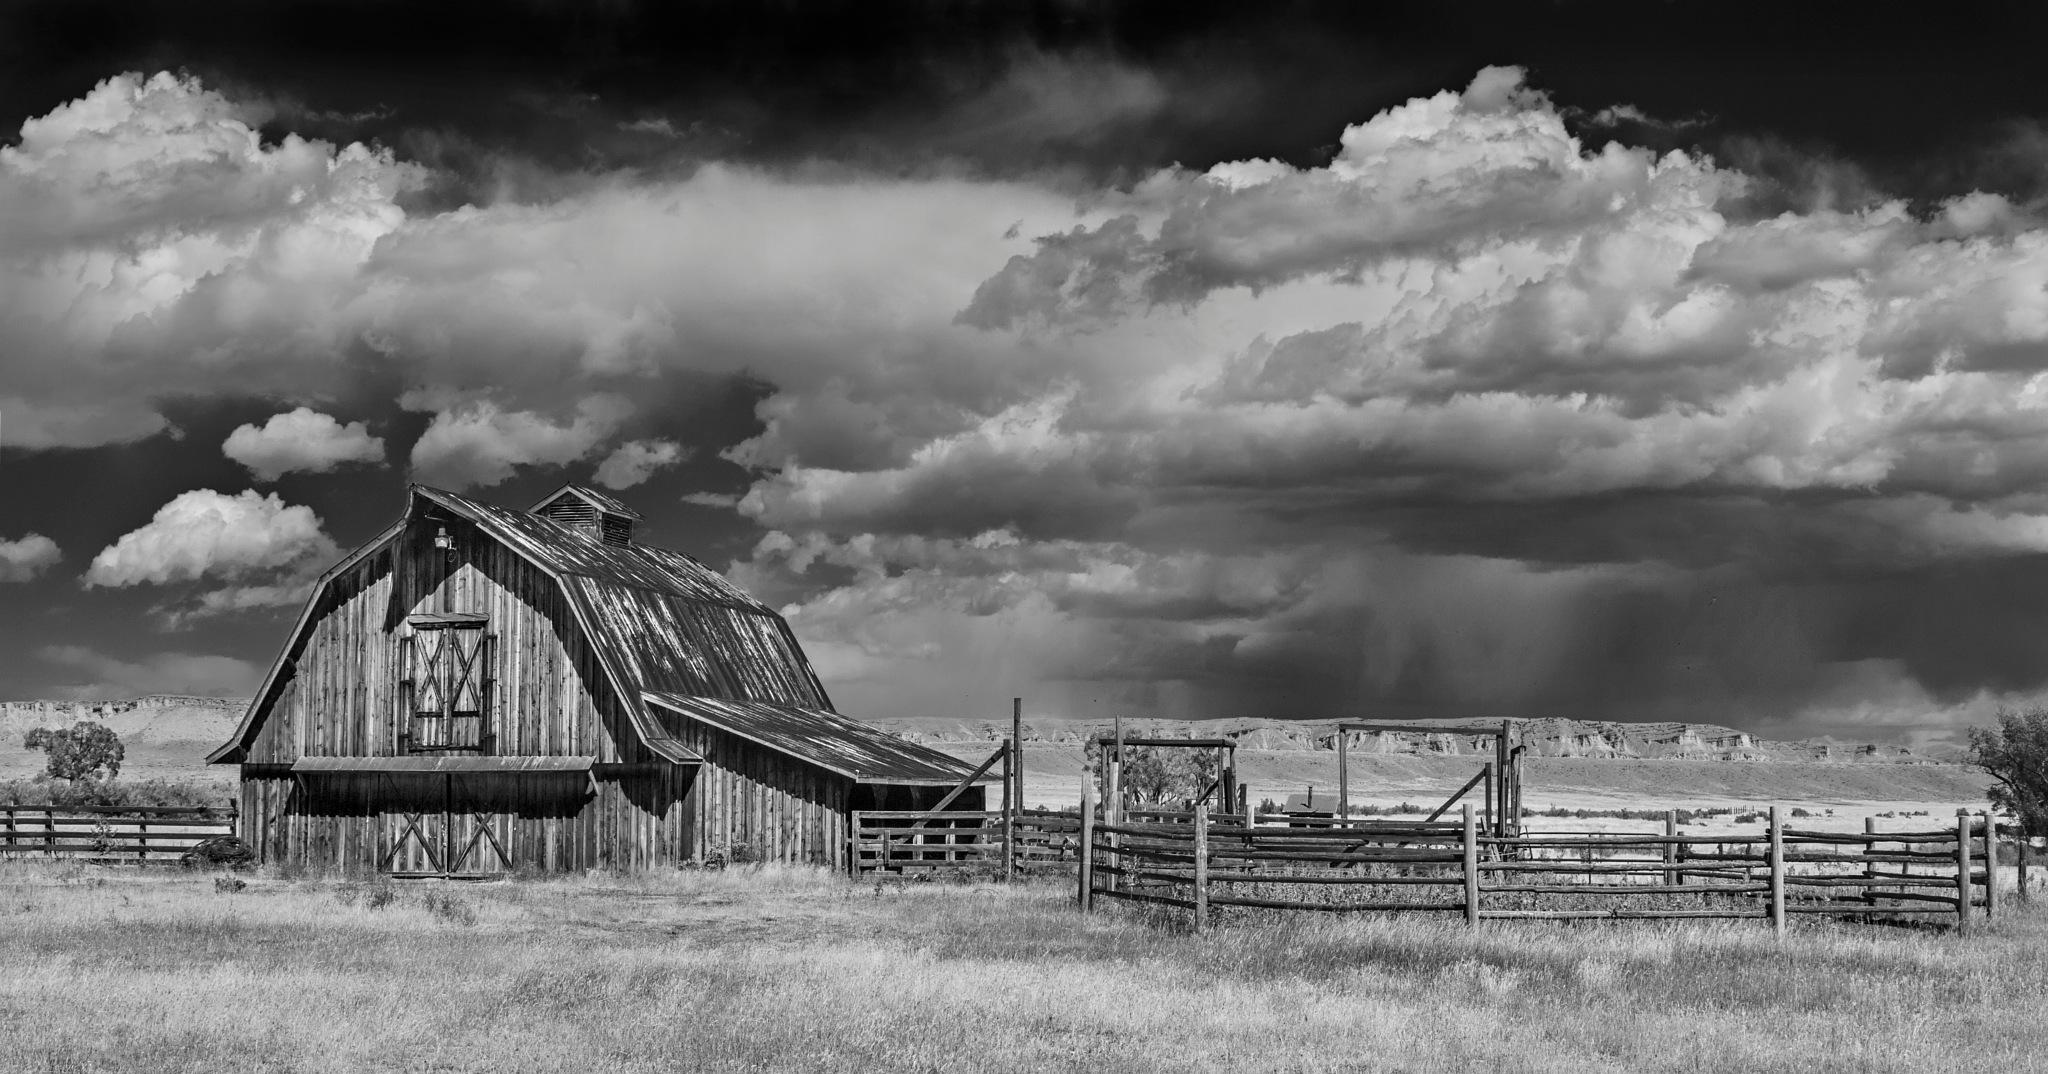 the Barn at Embar, WY by Eddie Tkowksi